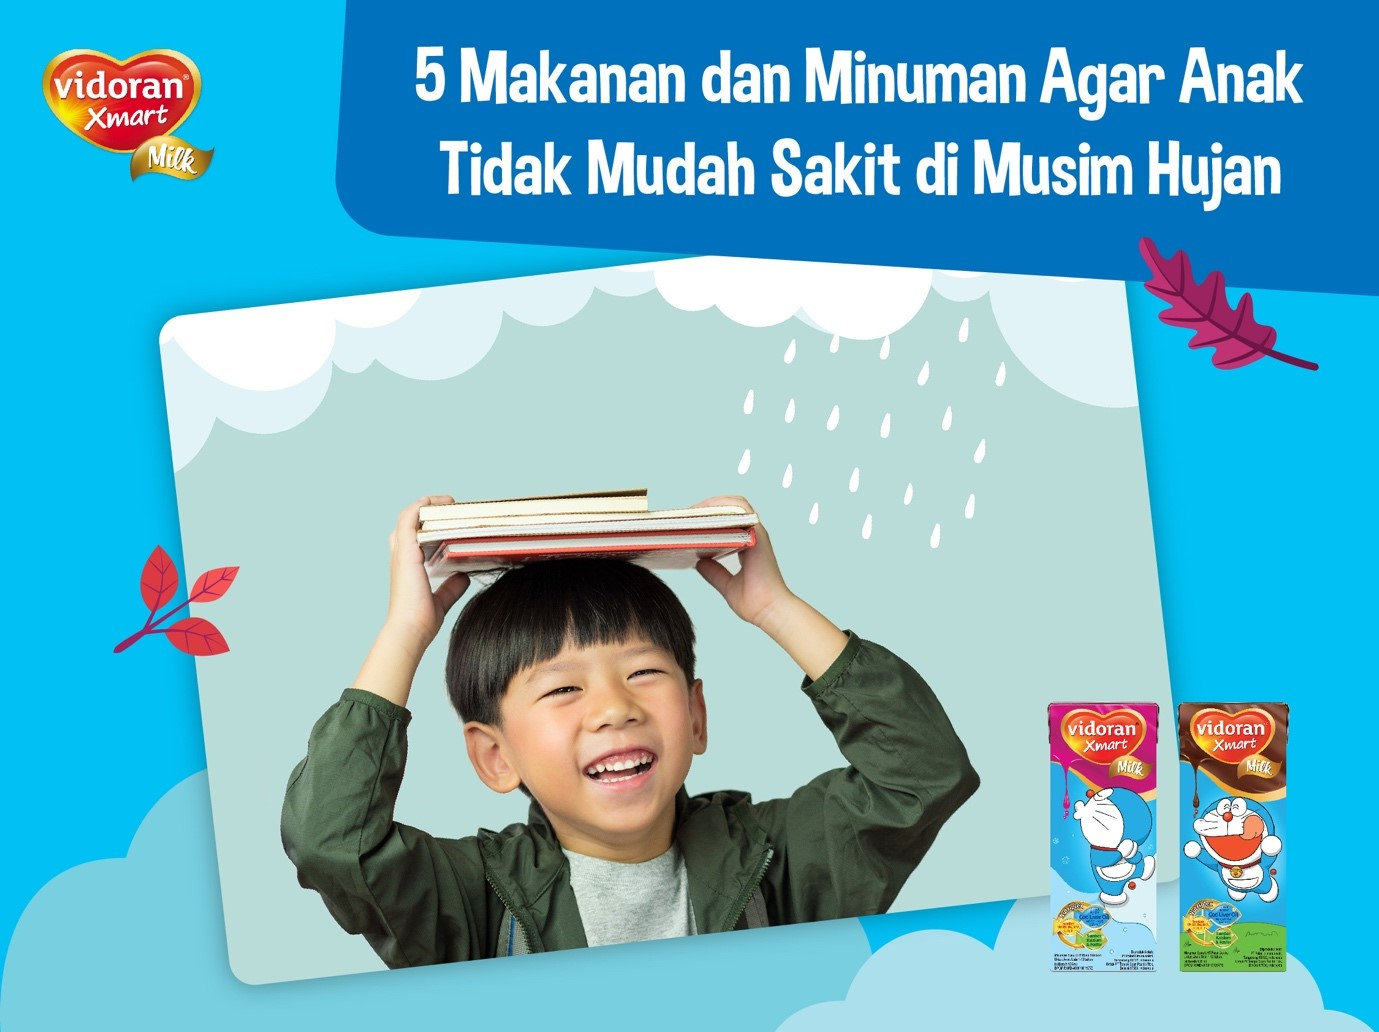 5 Makanan dan Minuman Agar Anak Tidak Mudah Sakit Di Musim Hujan